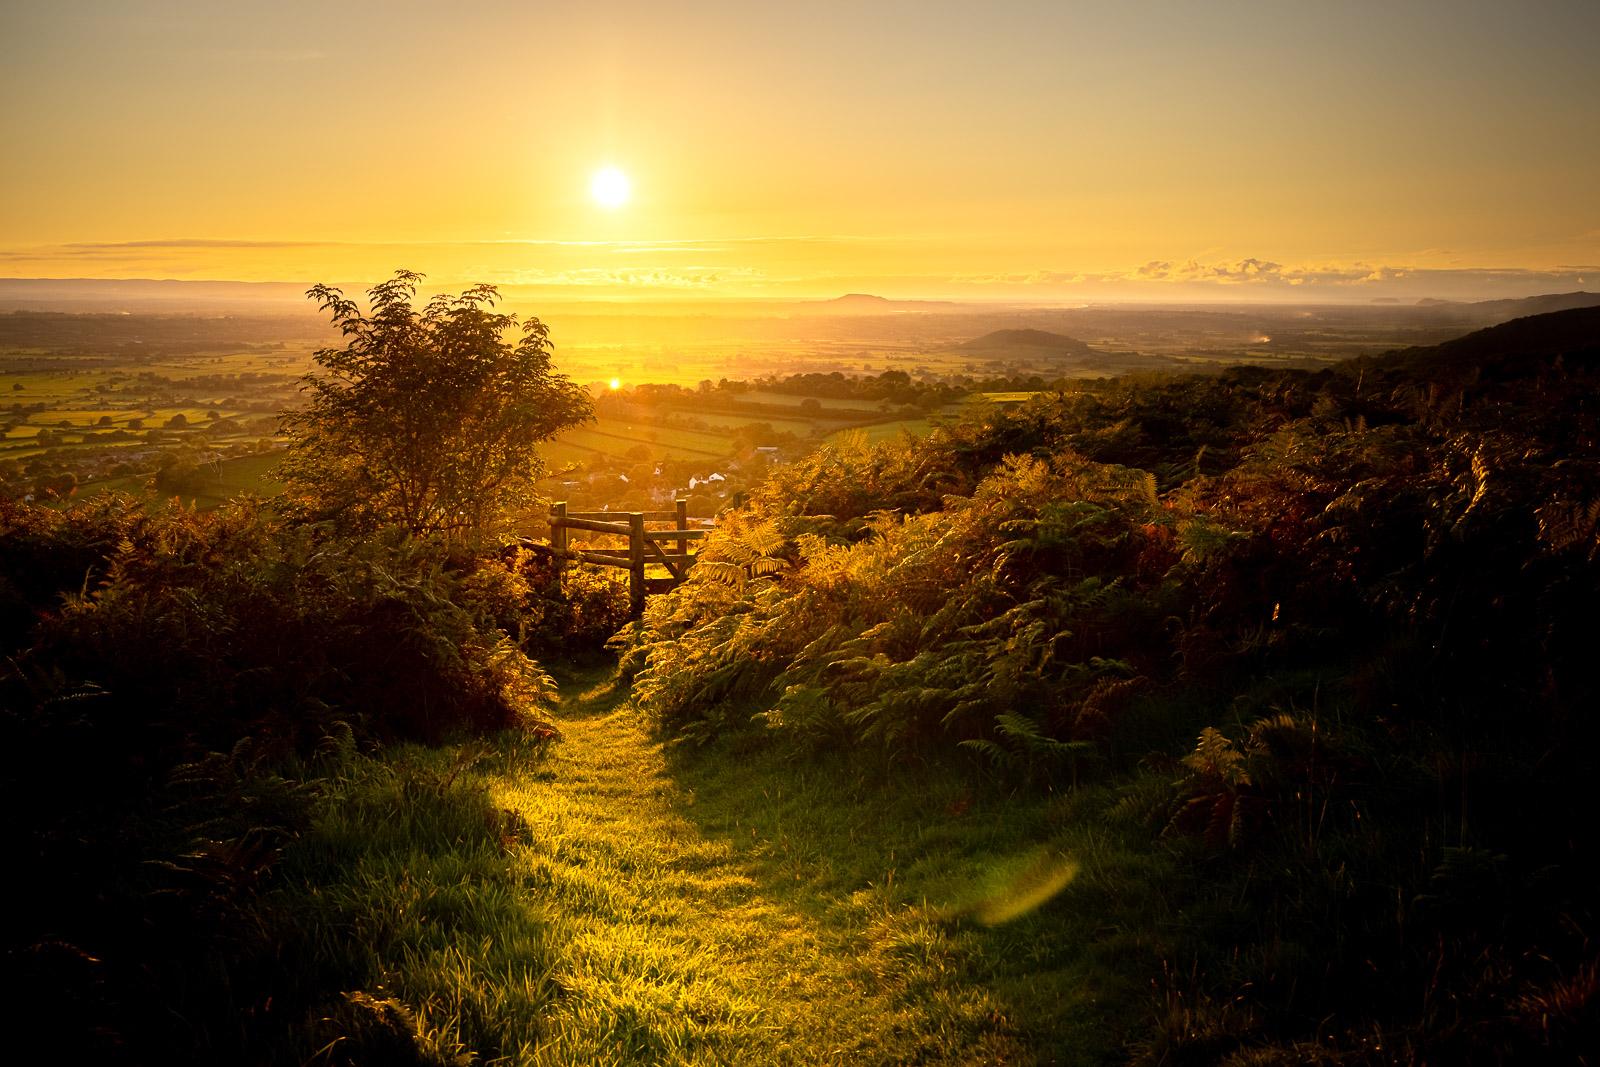 Autumn Equinox - Lynchcombe, Mendip Hills, Somerset, UK. ID BR57352